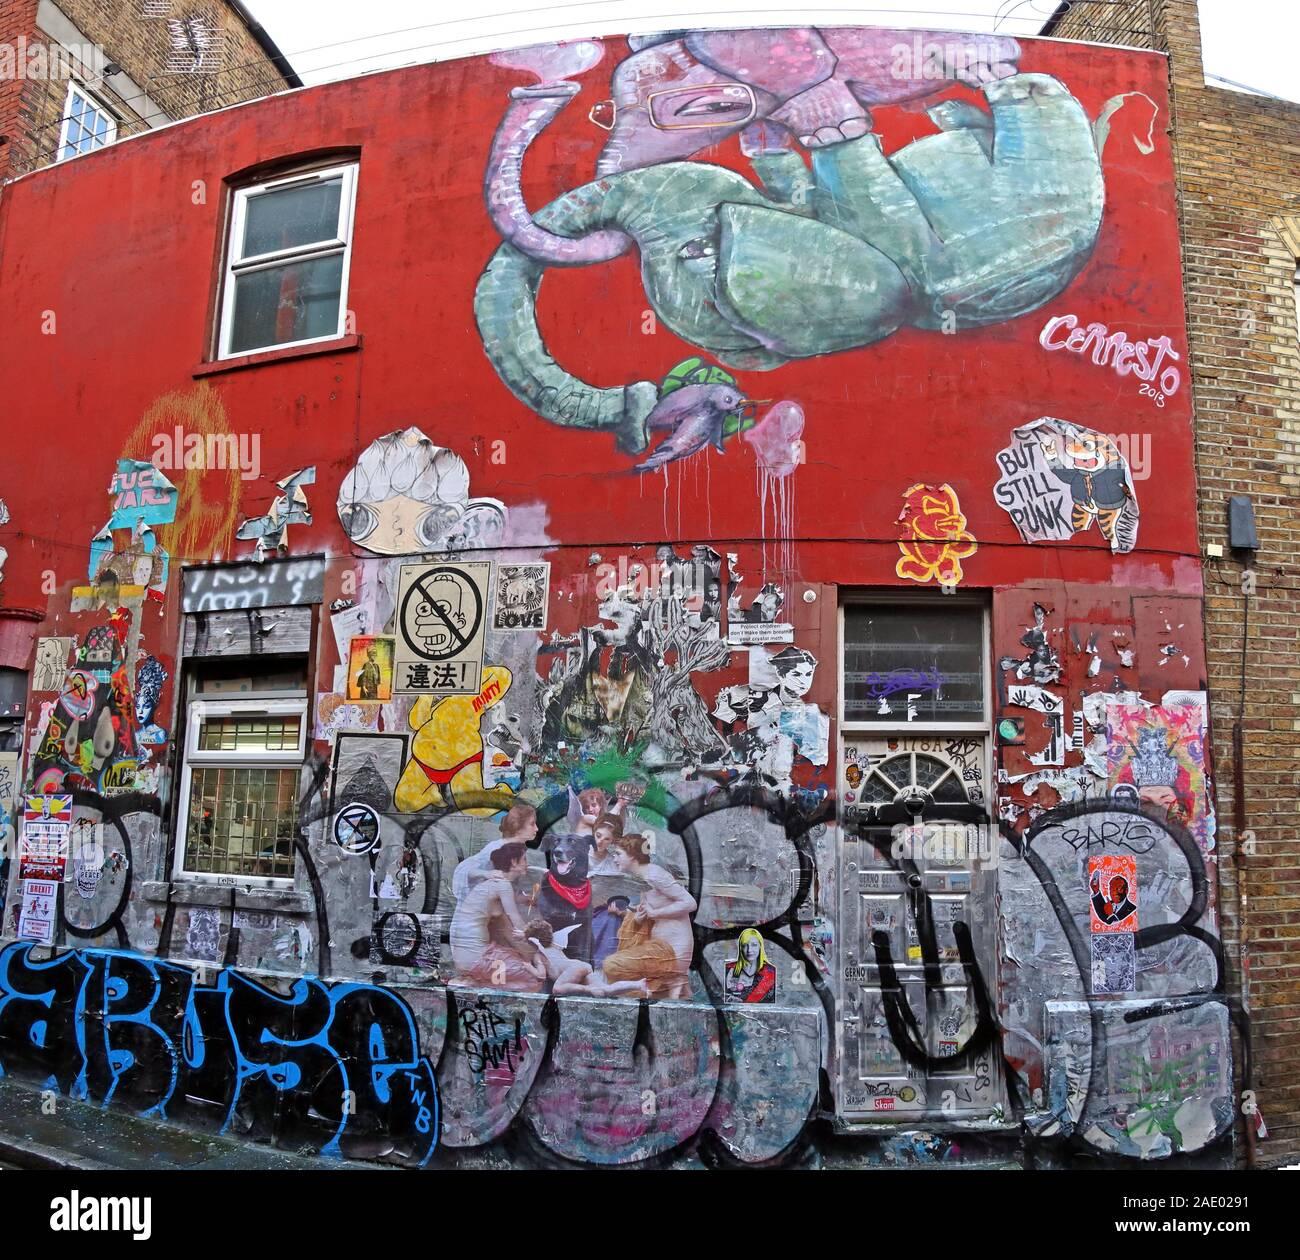 Dieses Stockfoto: Elefant, Abuse Tag, Brick Lane, Kunst und Graffiti, Shoreditch, Tower Hamlets, East End, London, Südosten, England, Großbritannien, E1 6QL - 2AE029